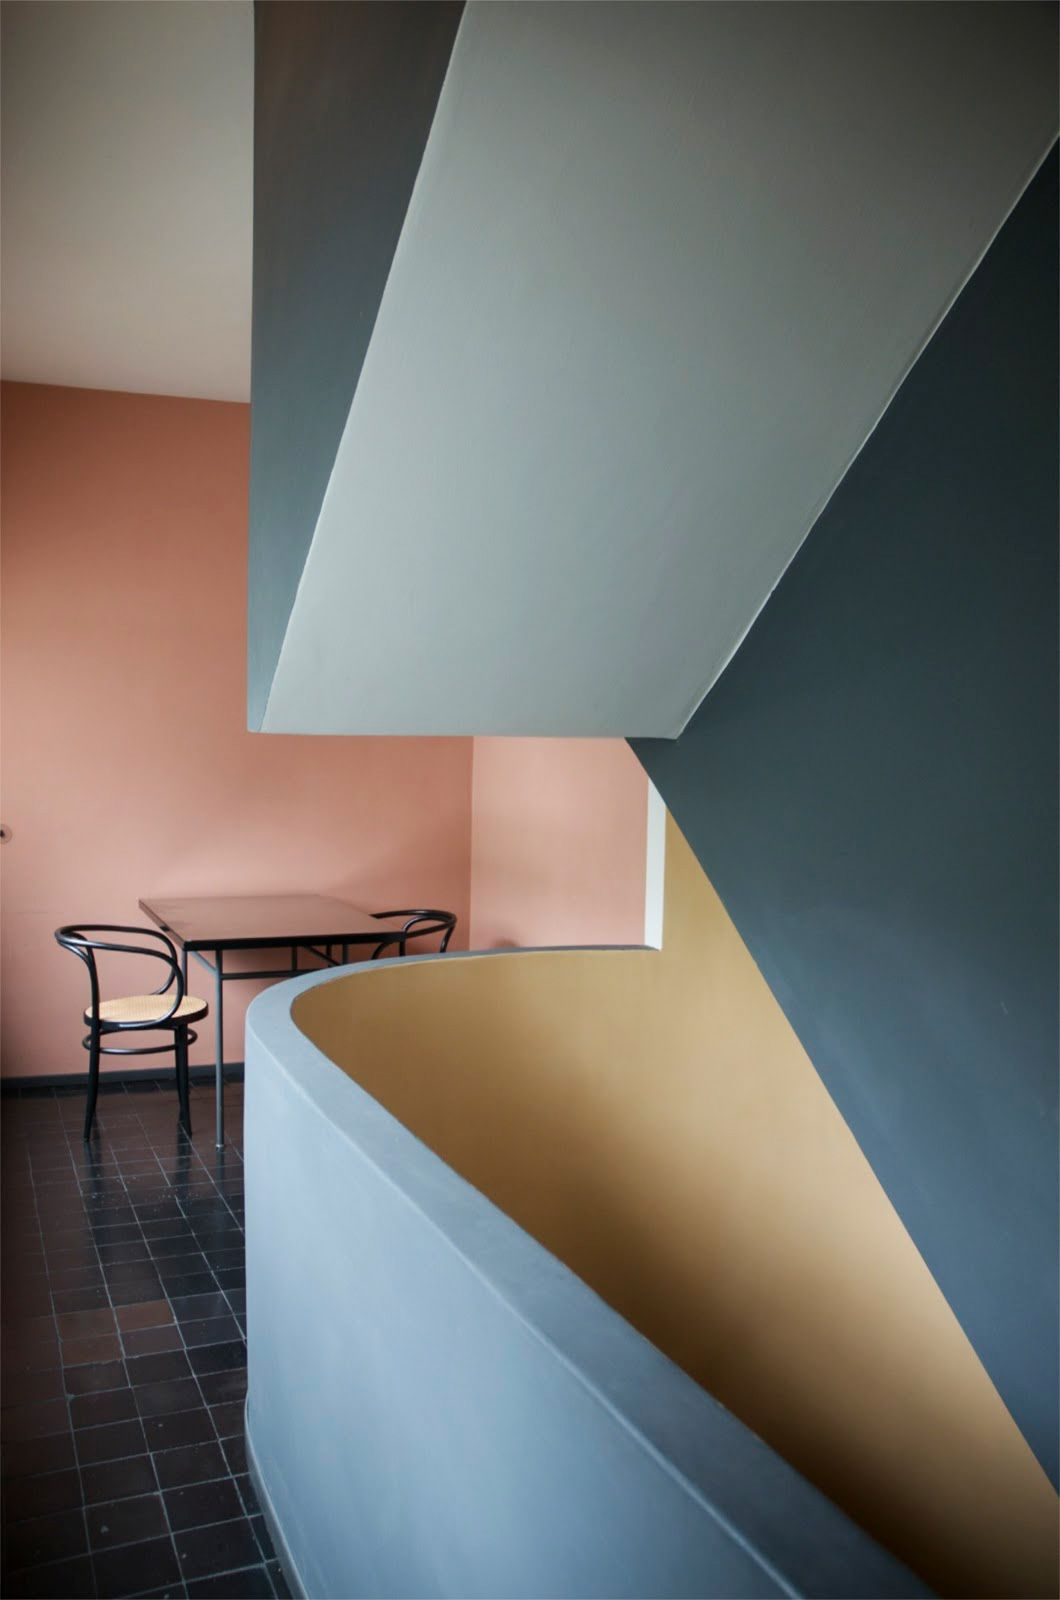 Scandinaviancollectors an interior from weissenhof house by pierre jeanneret le corbusier stuttgart